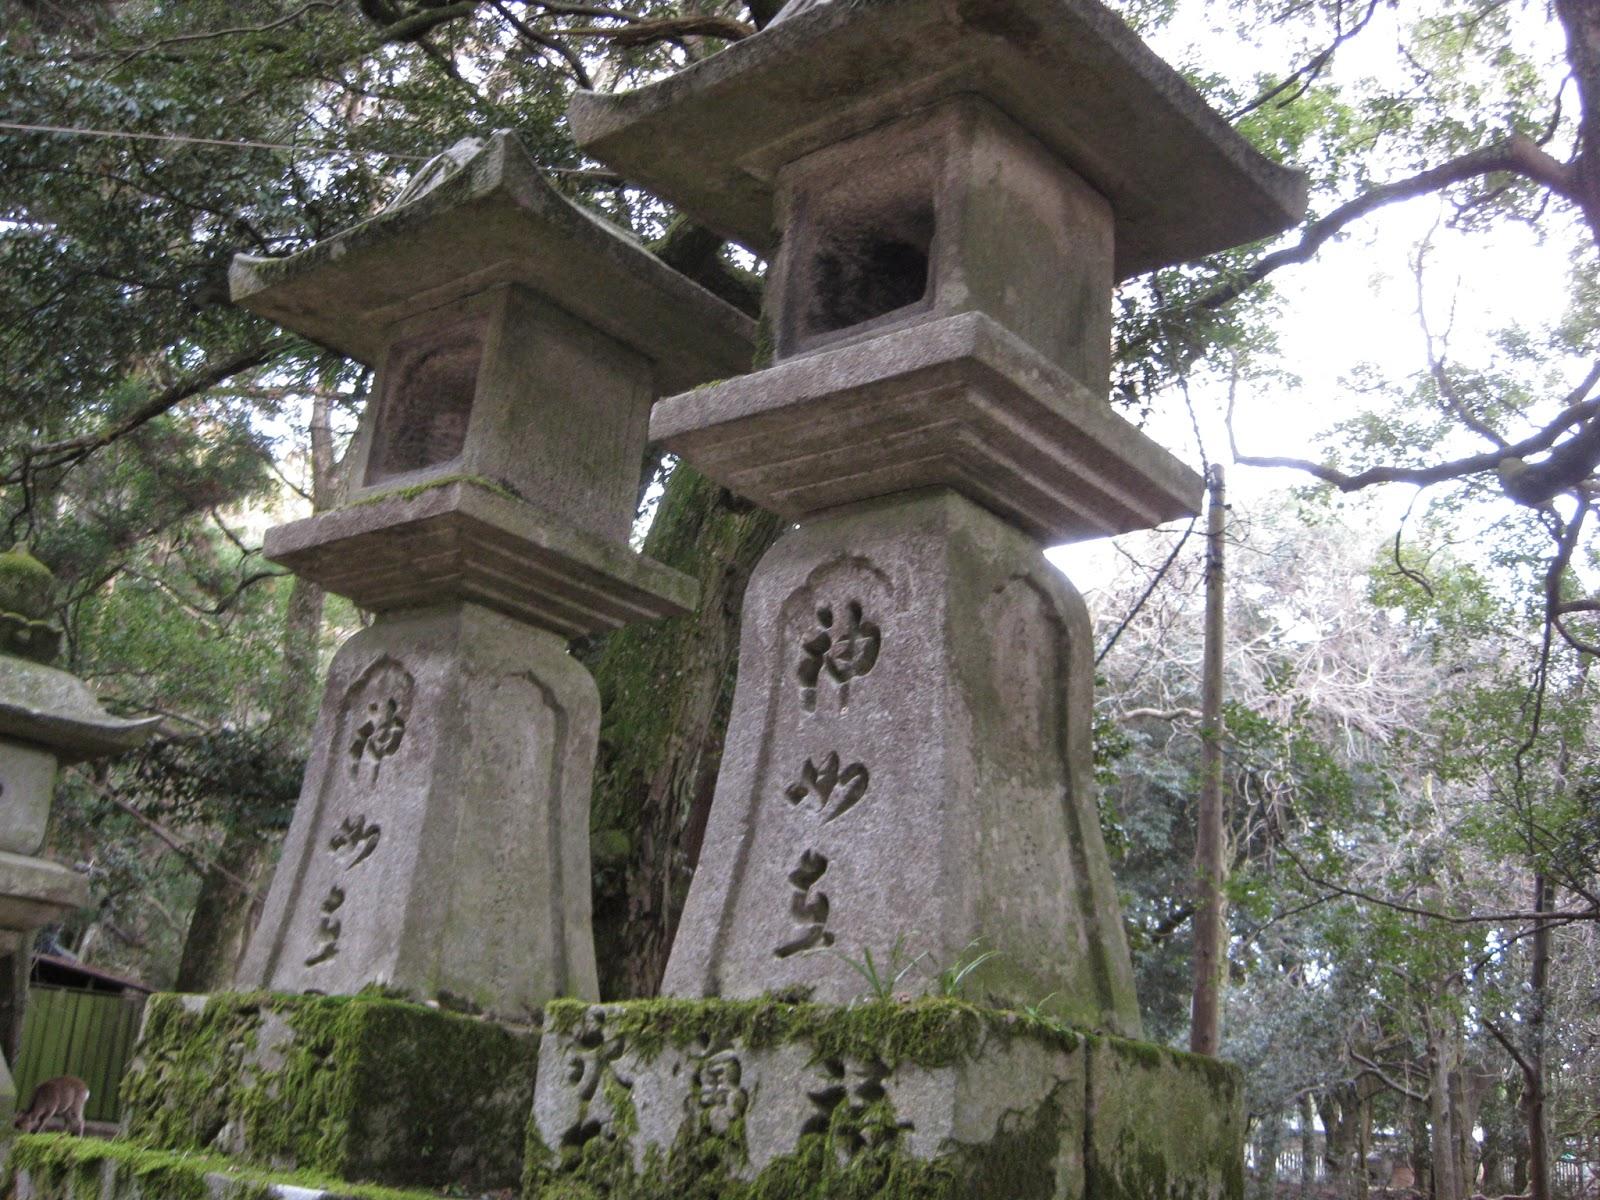 Kyoto - Stone temples line the pathway to Kasuga-taisha Shrine